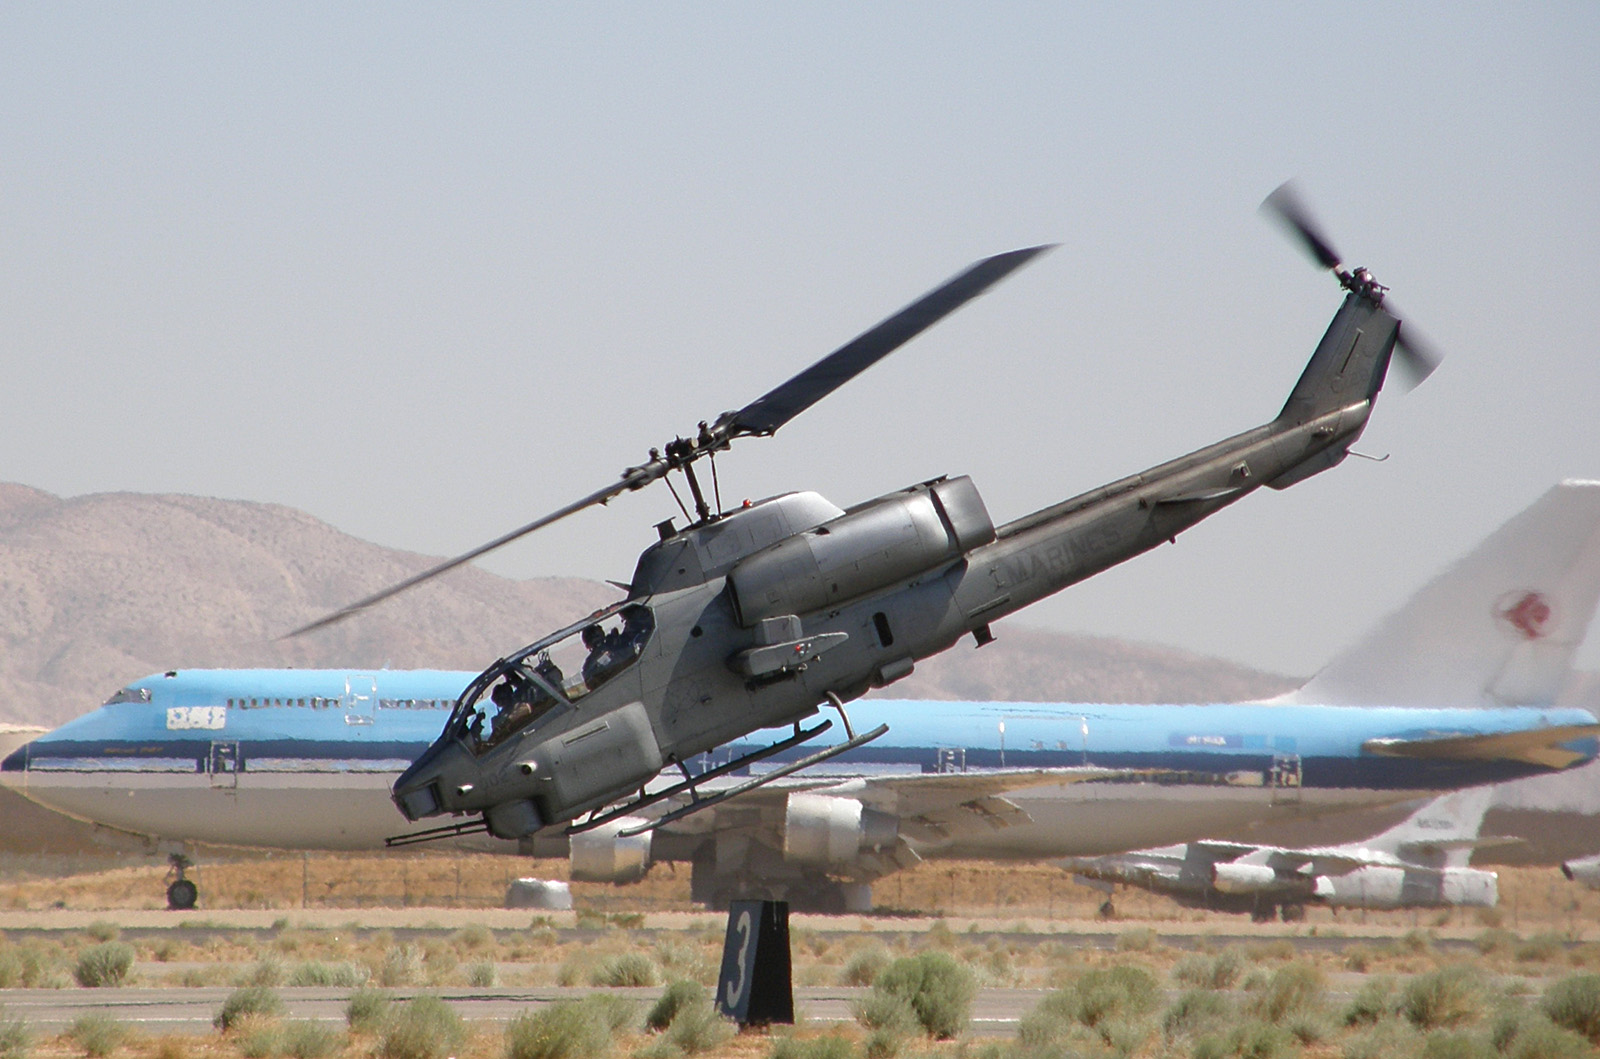 Bell AH-1 SuperCobra | Military Wiki | FANDOM powered by Wikia Ah